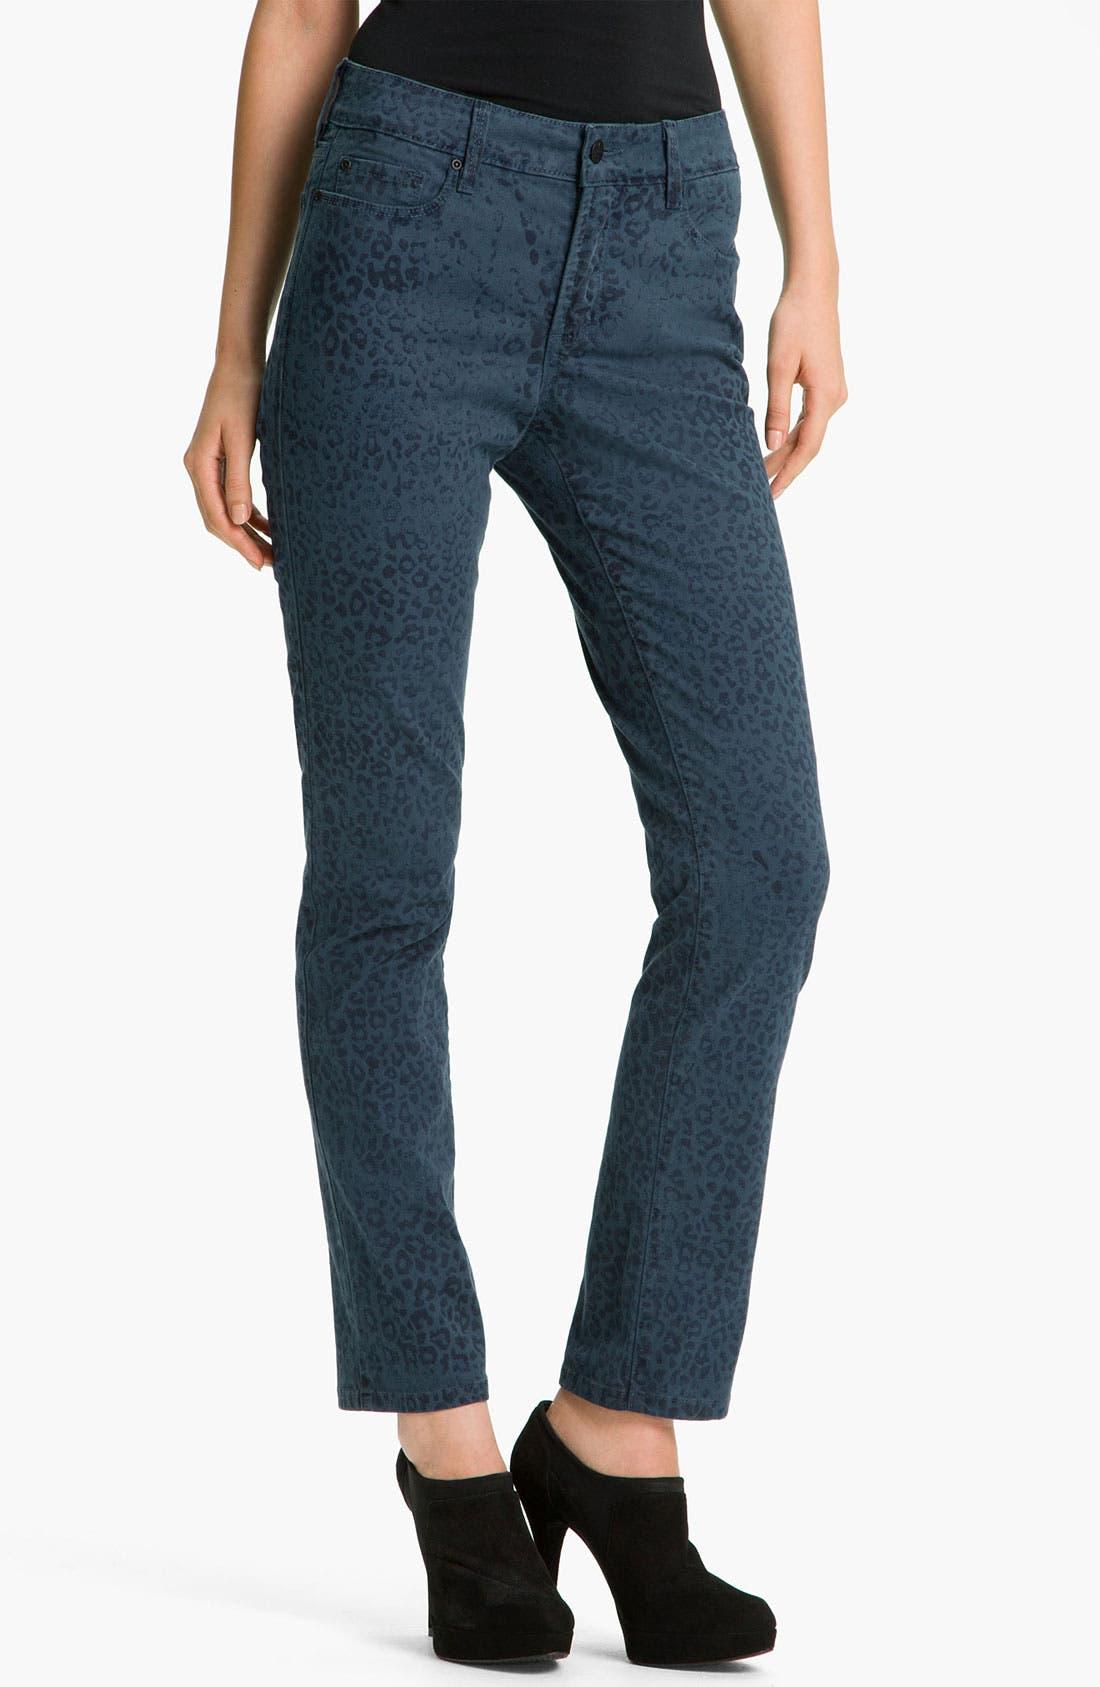 Alternate Image 1 Selected - NYDJ 'Sheri - Cheetah' Print Skinny Twill Jeans